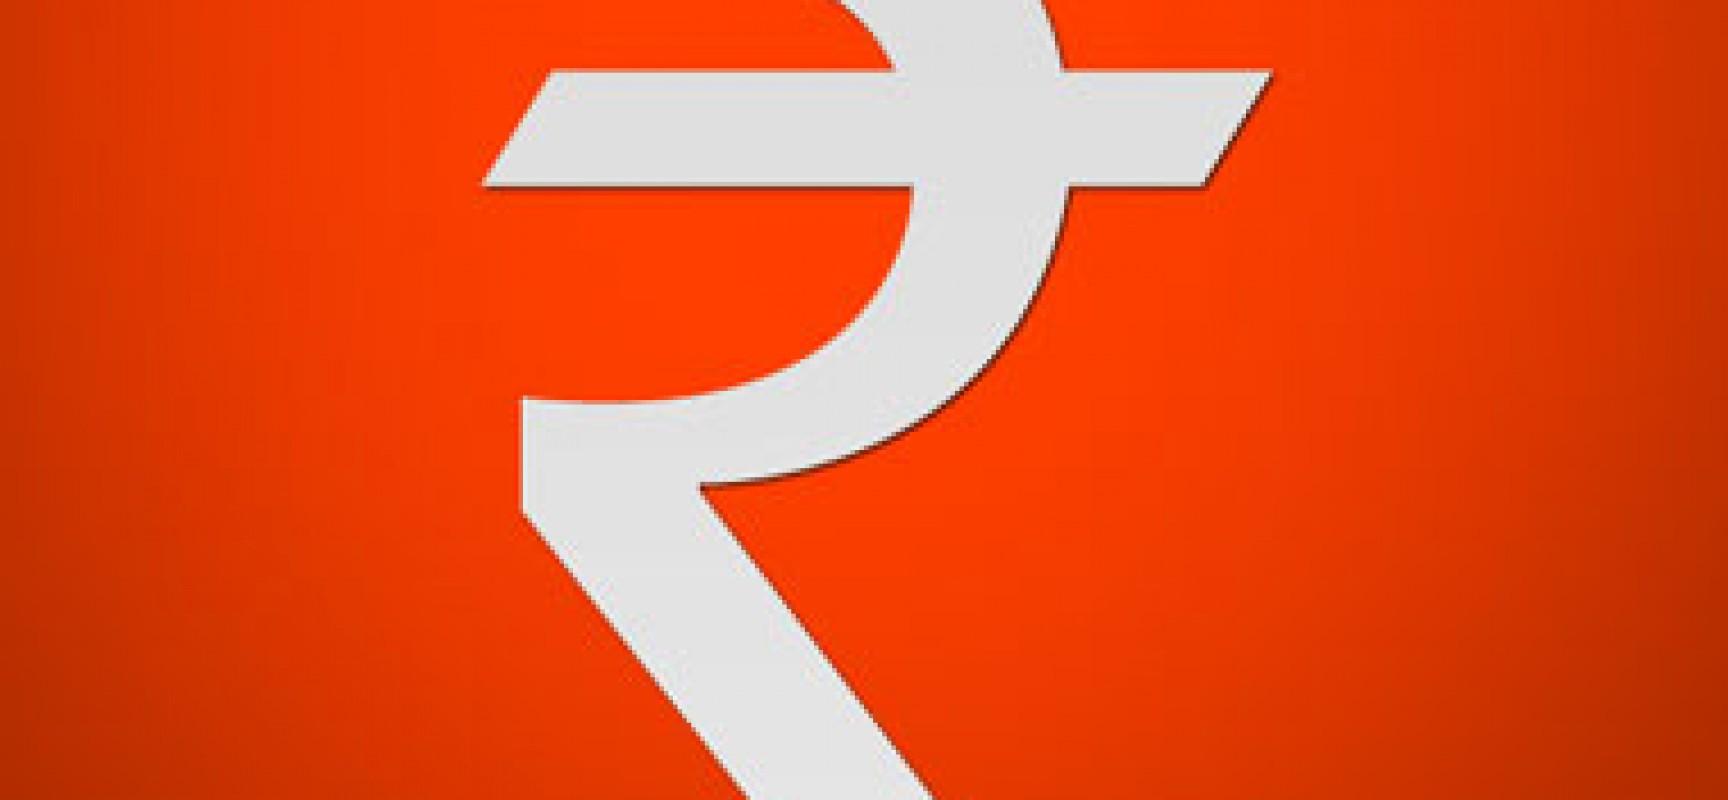 Rupee Depreciation Saga